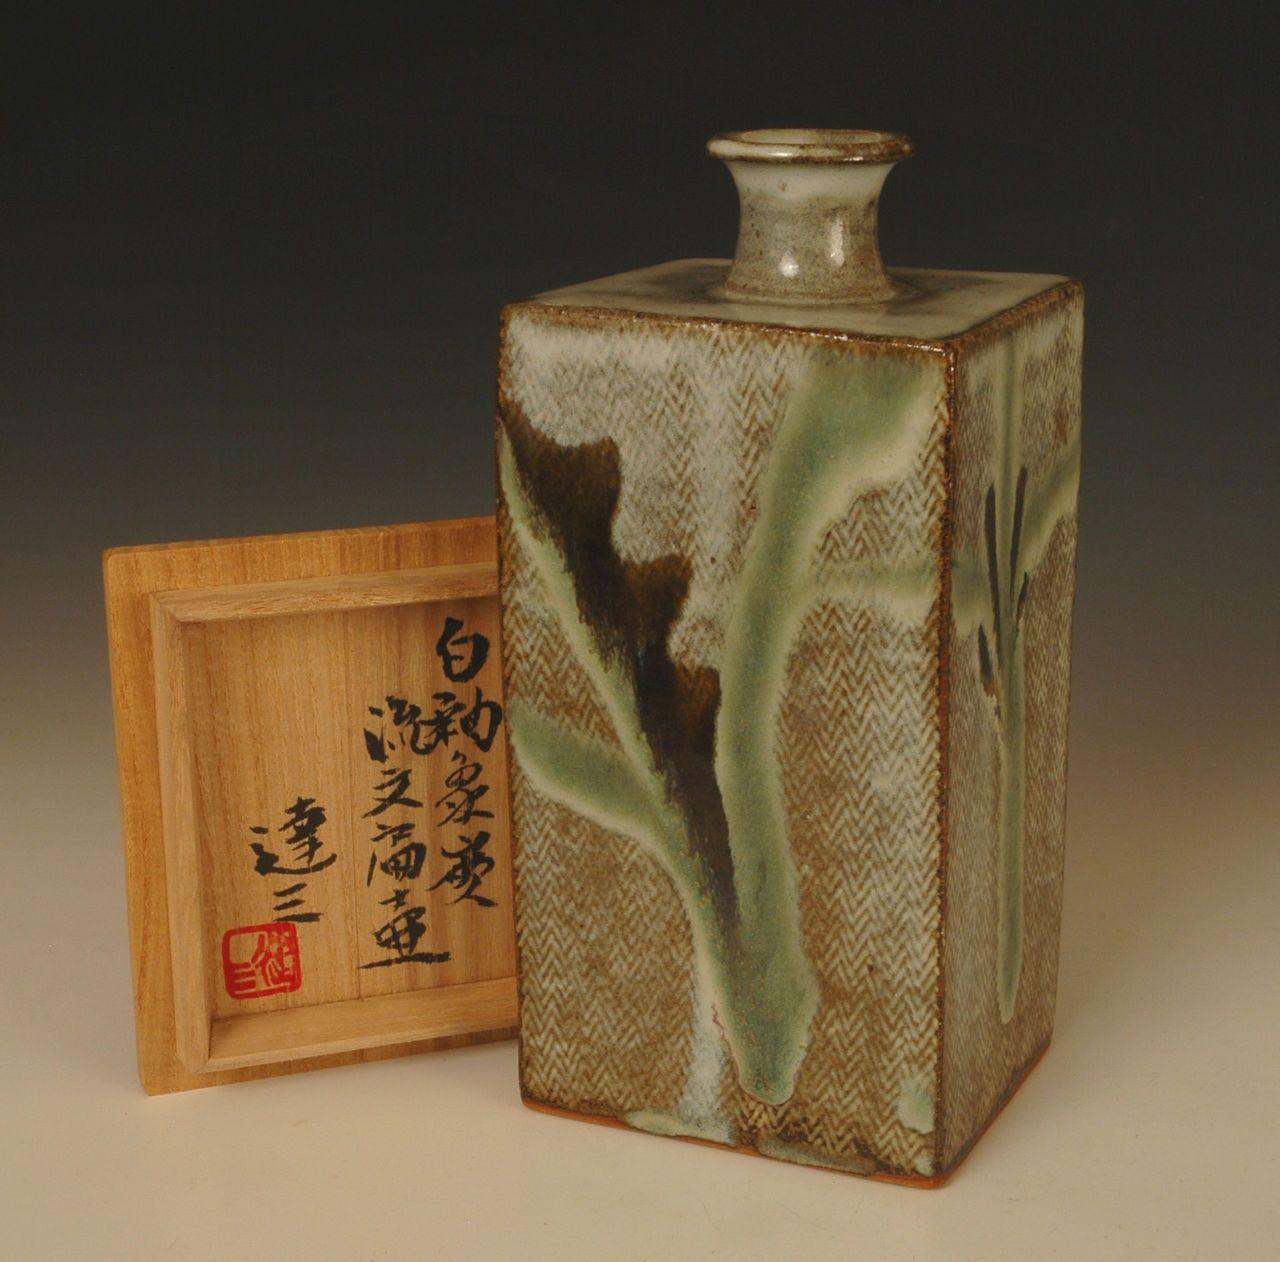 Press moulded bottle by Tatsuzo Shimaoka - Tatsuzō Shimaoka - Wikipedia, the free encyclopedia